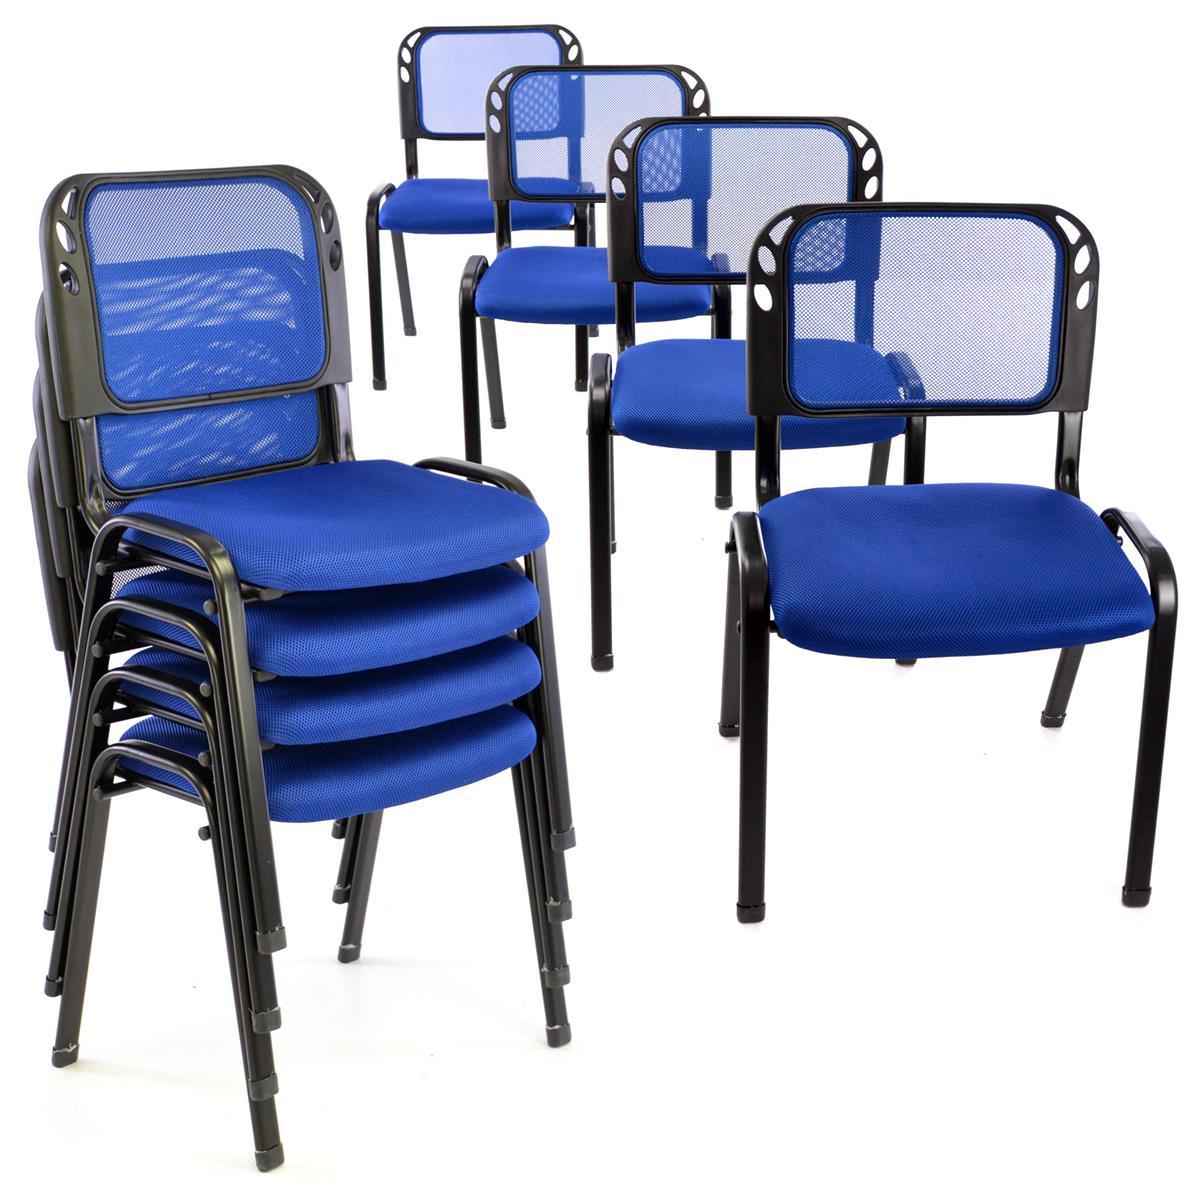 Besucherstuhl 8er Set Konferenzstuhl Sitzfläche blau gepolstert stapelbar